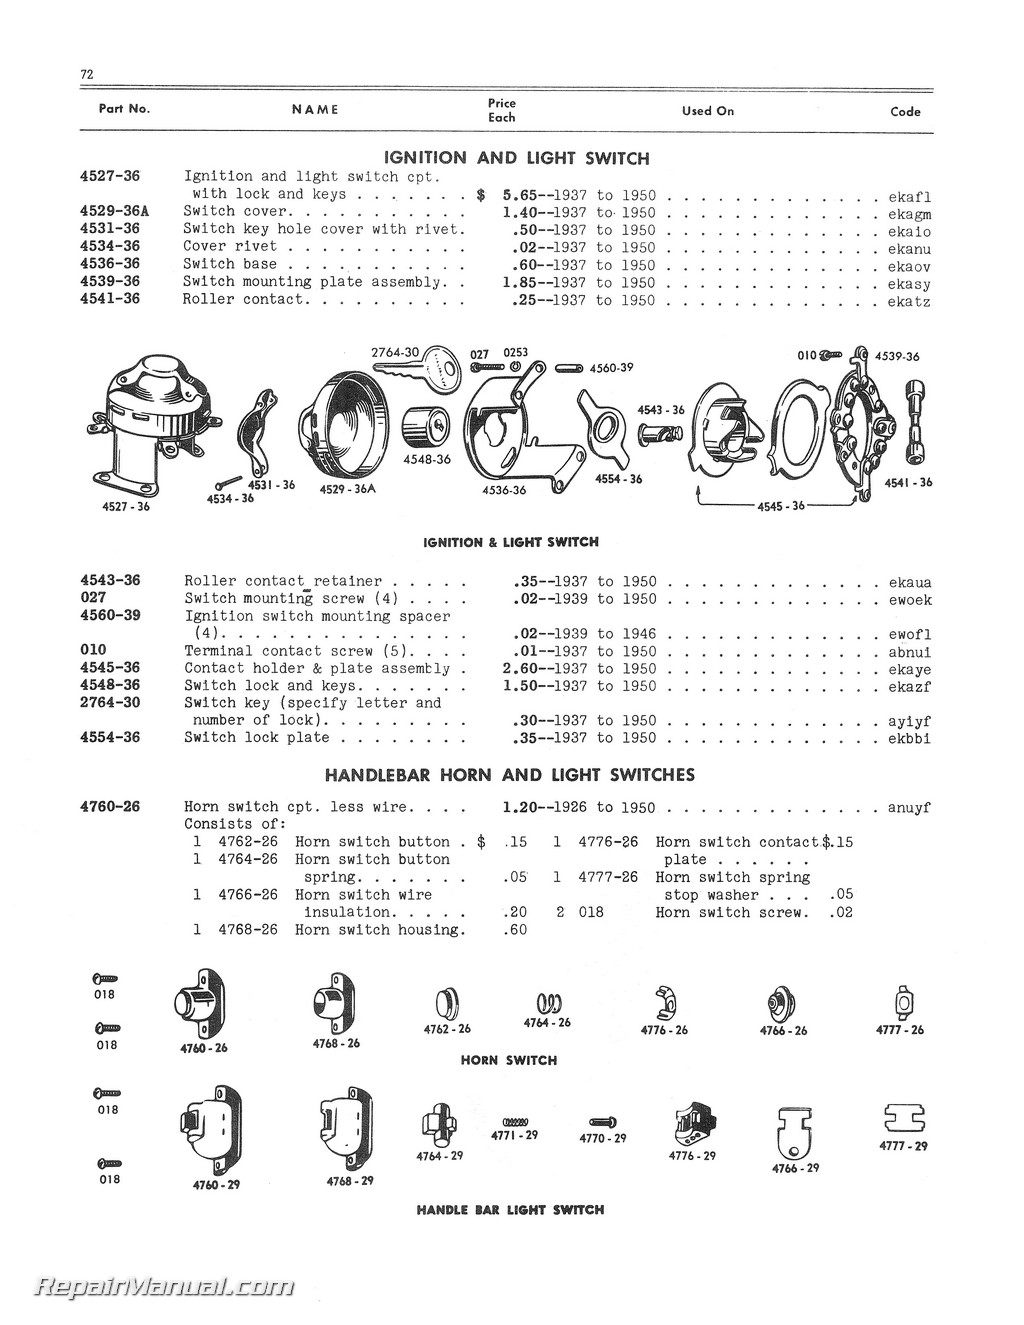 1997 Dyna Wiring Diagram Diagrams Harley Davidson Wide Glide Electrical Flsts 2000i Ignition